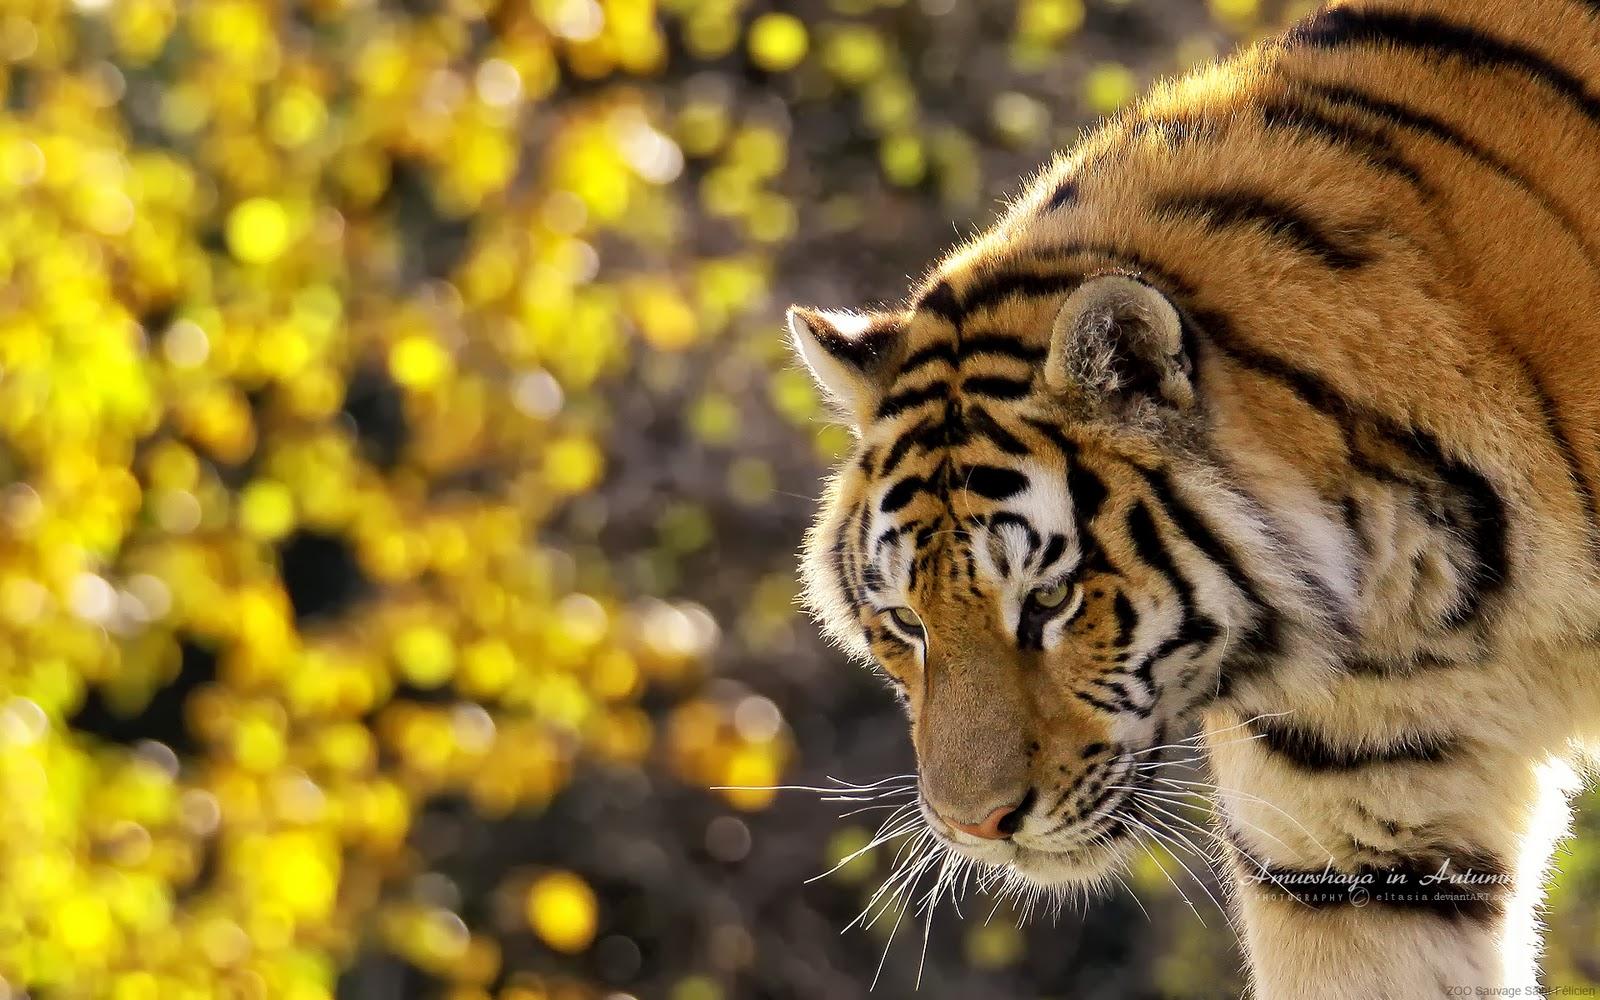 Husn ke nazare tigers wallpapers - Nature ke wallpaper ...